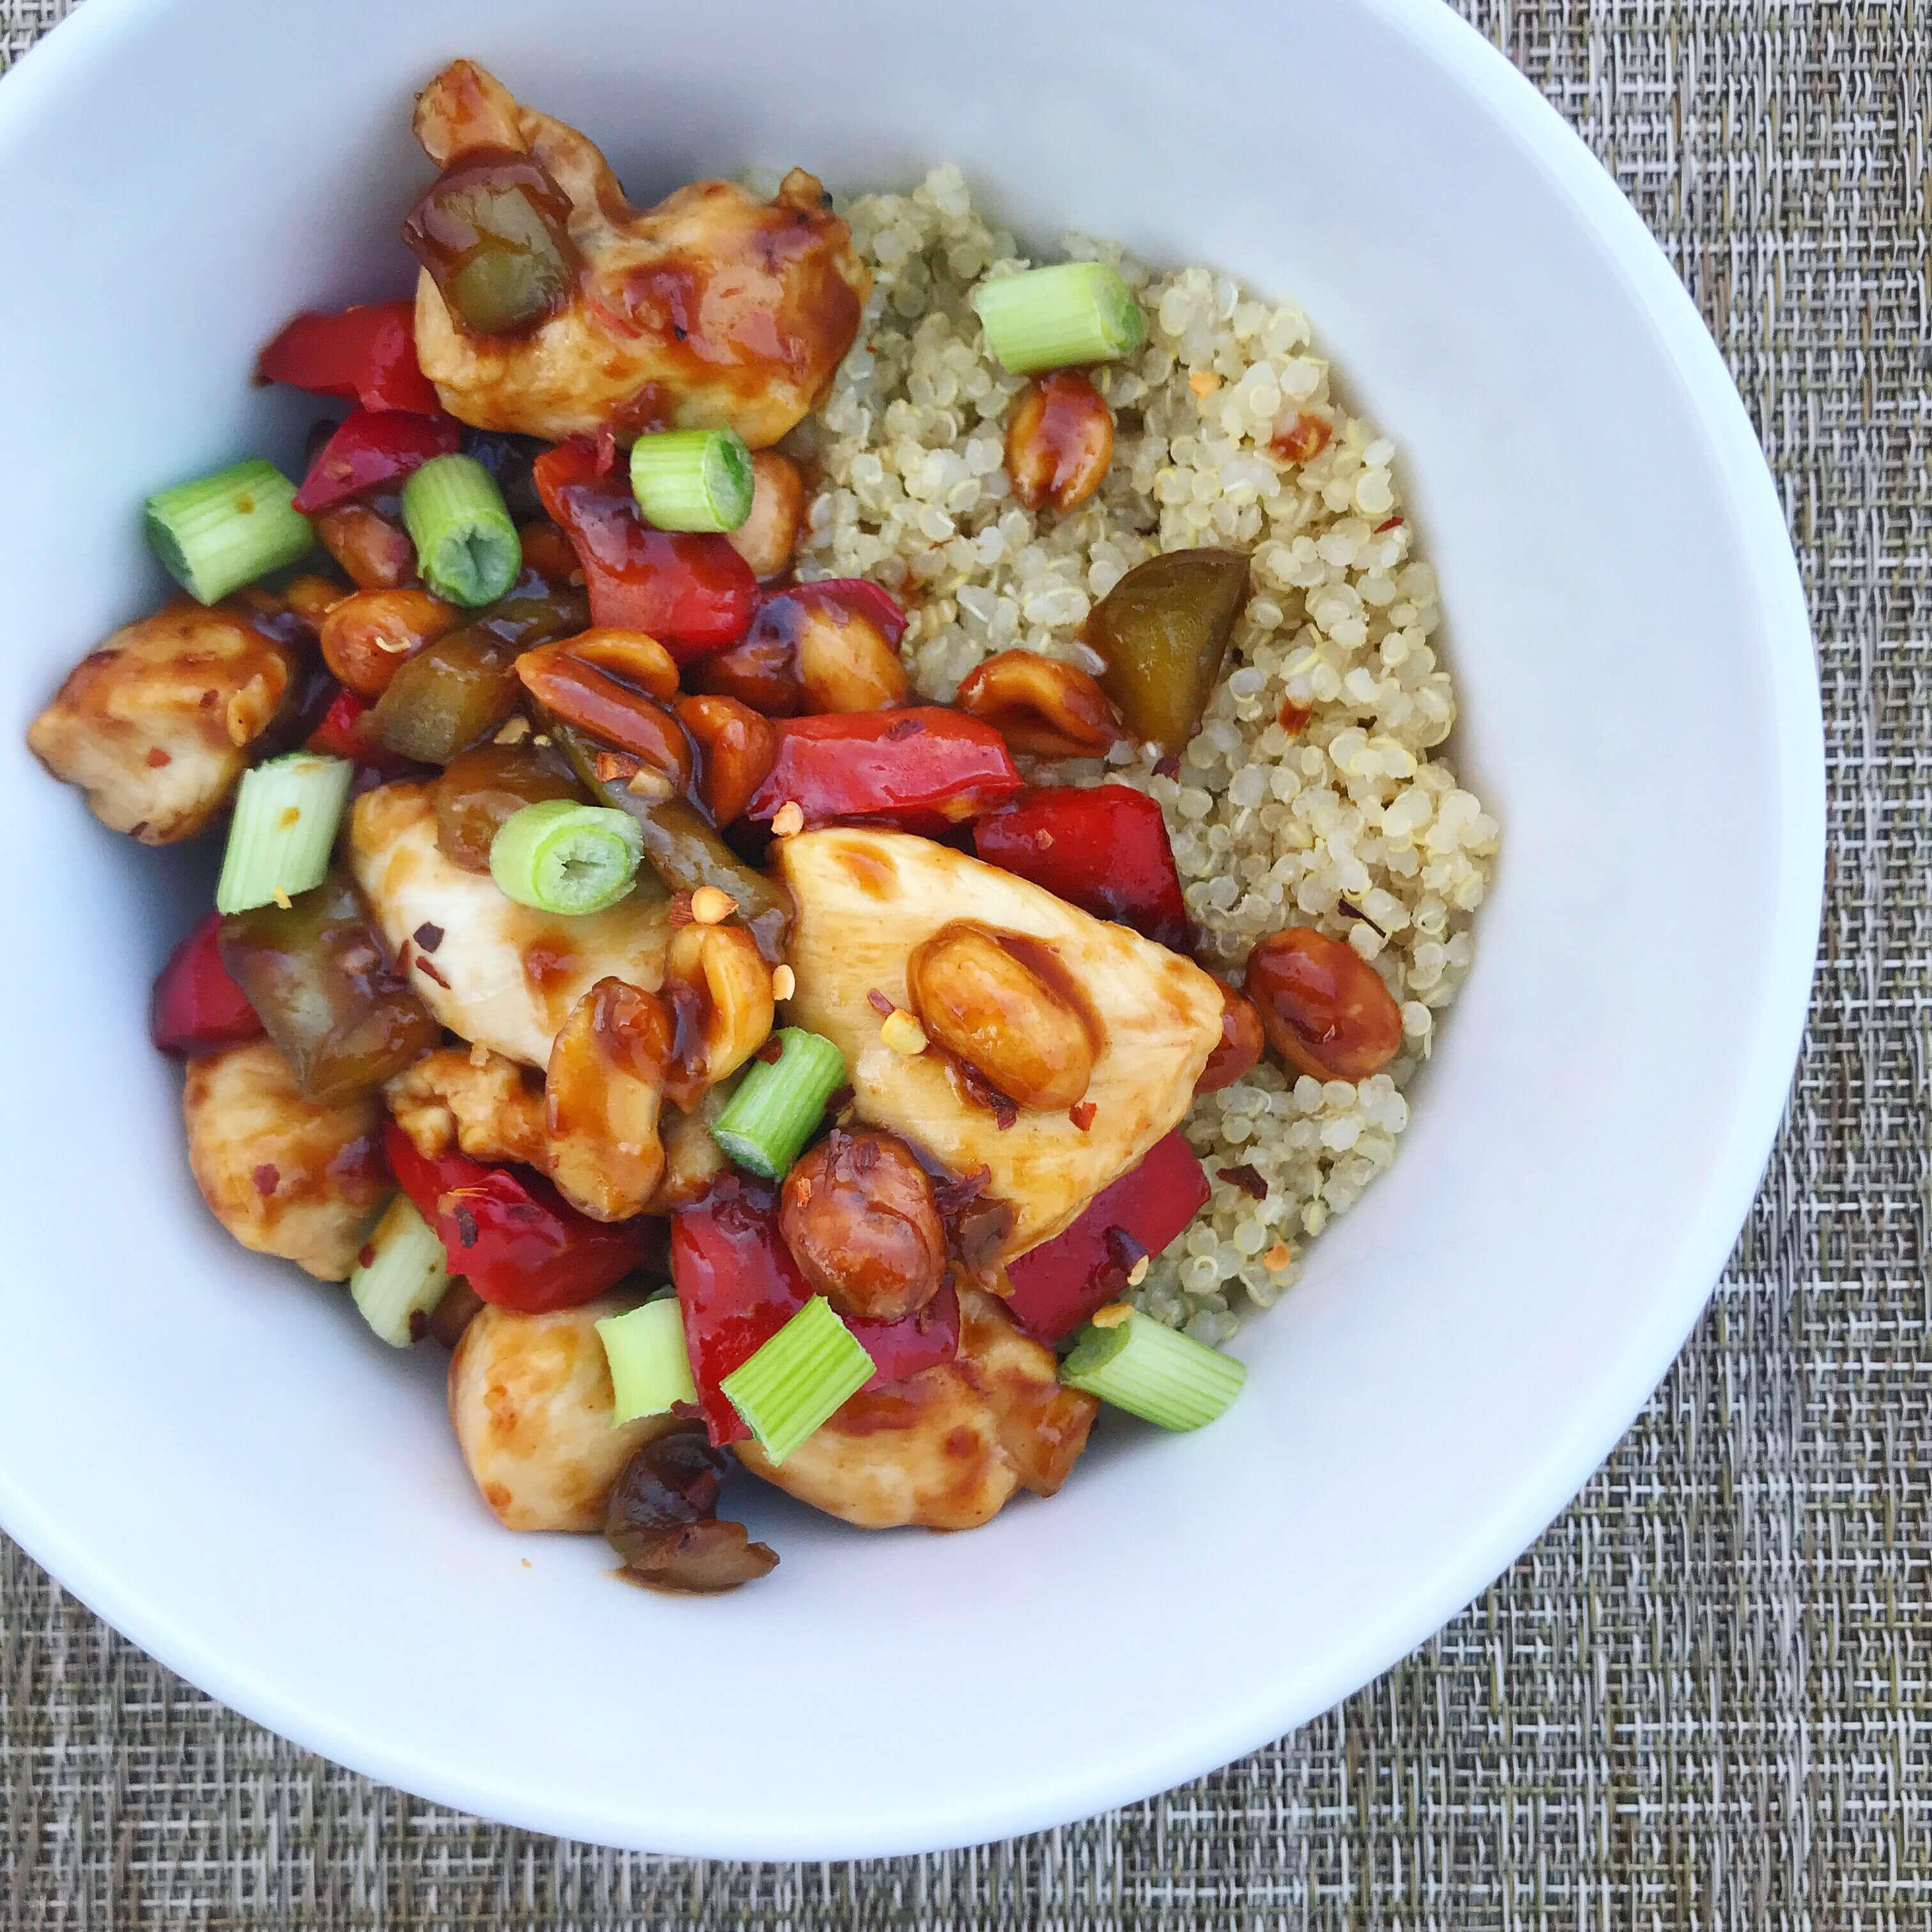 healthy foods dietitians keep in their fridges - quinoa